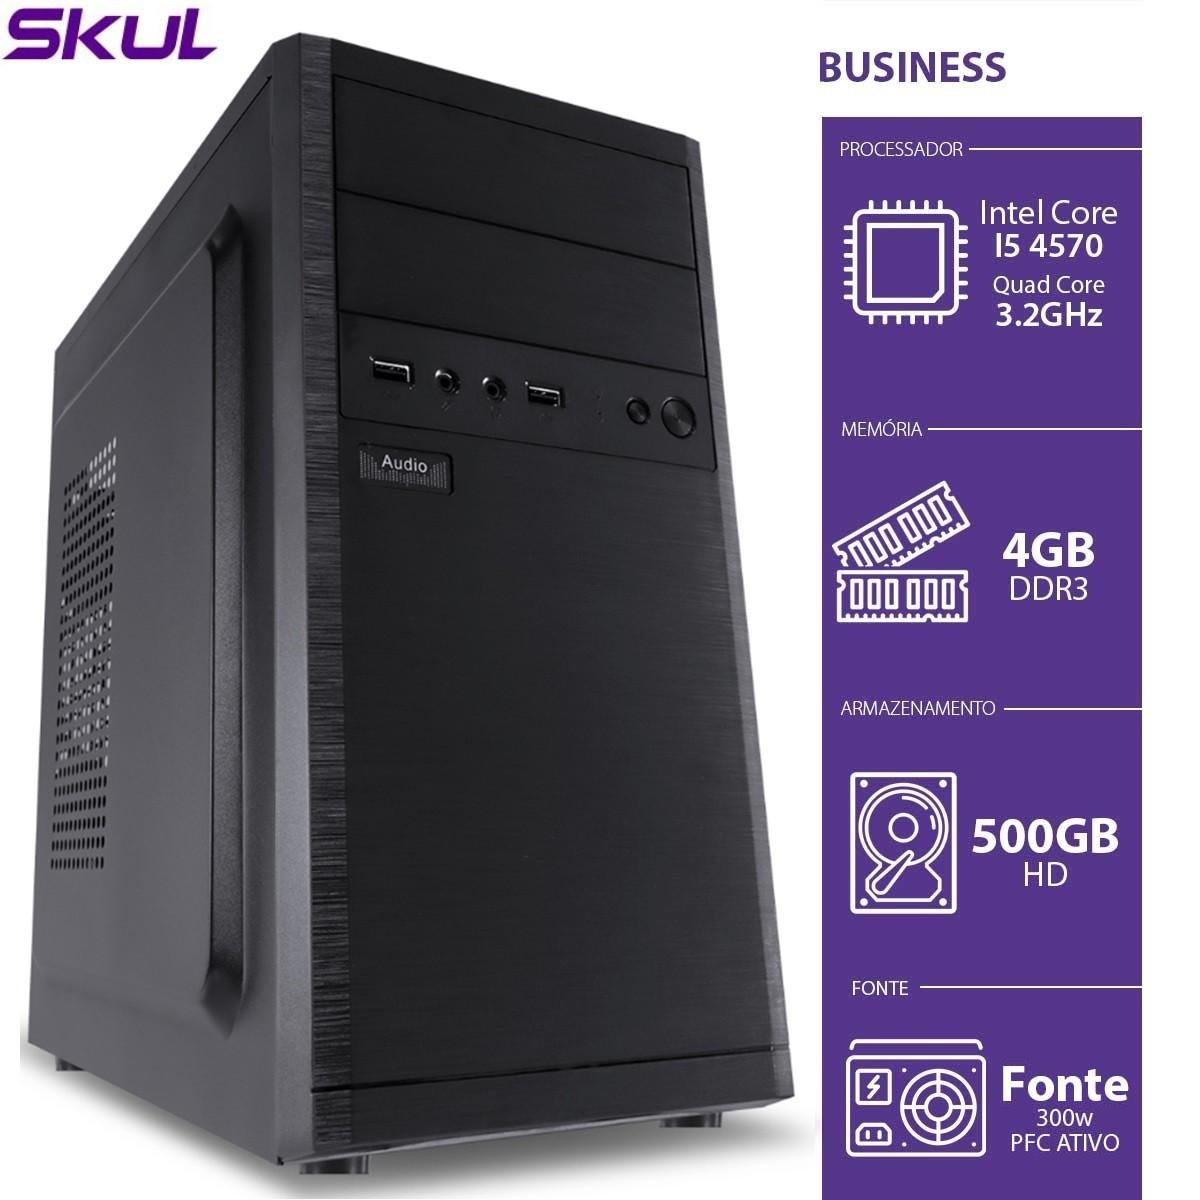 Computador Business B500 - I5-4570 3.2GHZ 4GB DDR3 HD 500GB HDMI/VGA Fonte 300 PFC Ativo